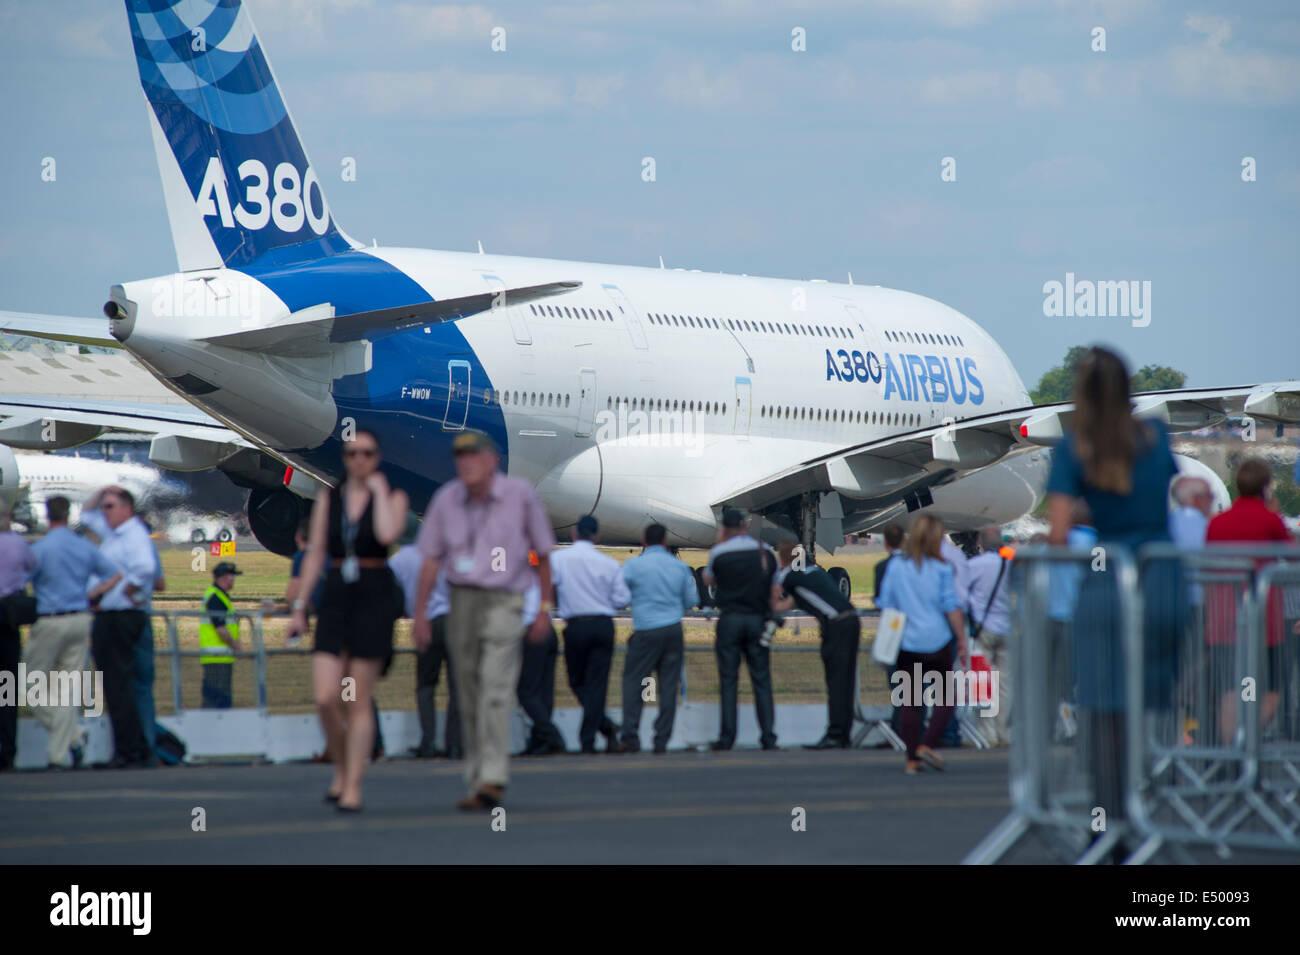 farnborough-aerodrome-hampshire-uk-17th-